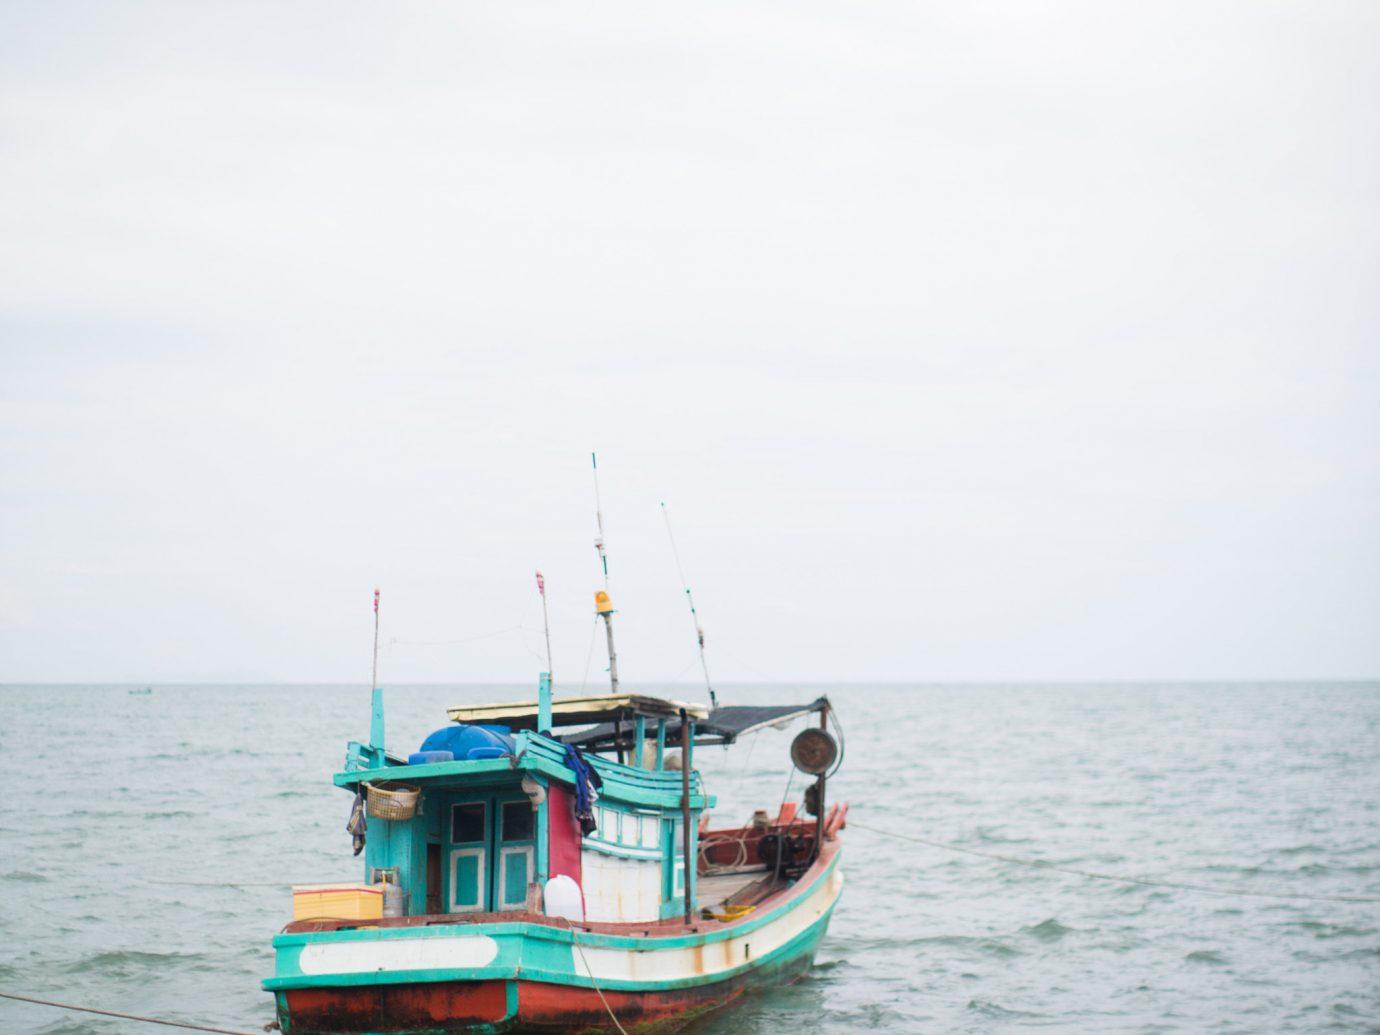 water outdoor sky Boat vehicle Sea ferry fishing vessel watercraft channel Ocean bay Coast boating ship